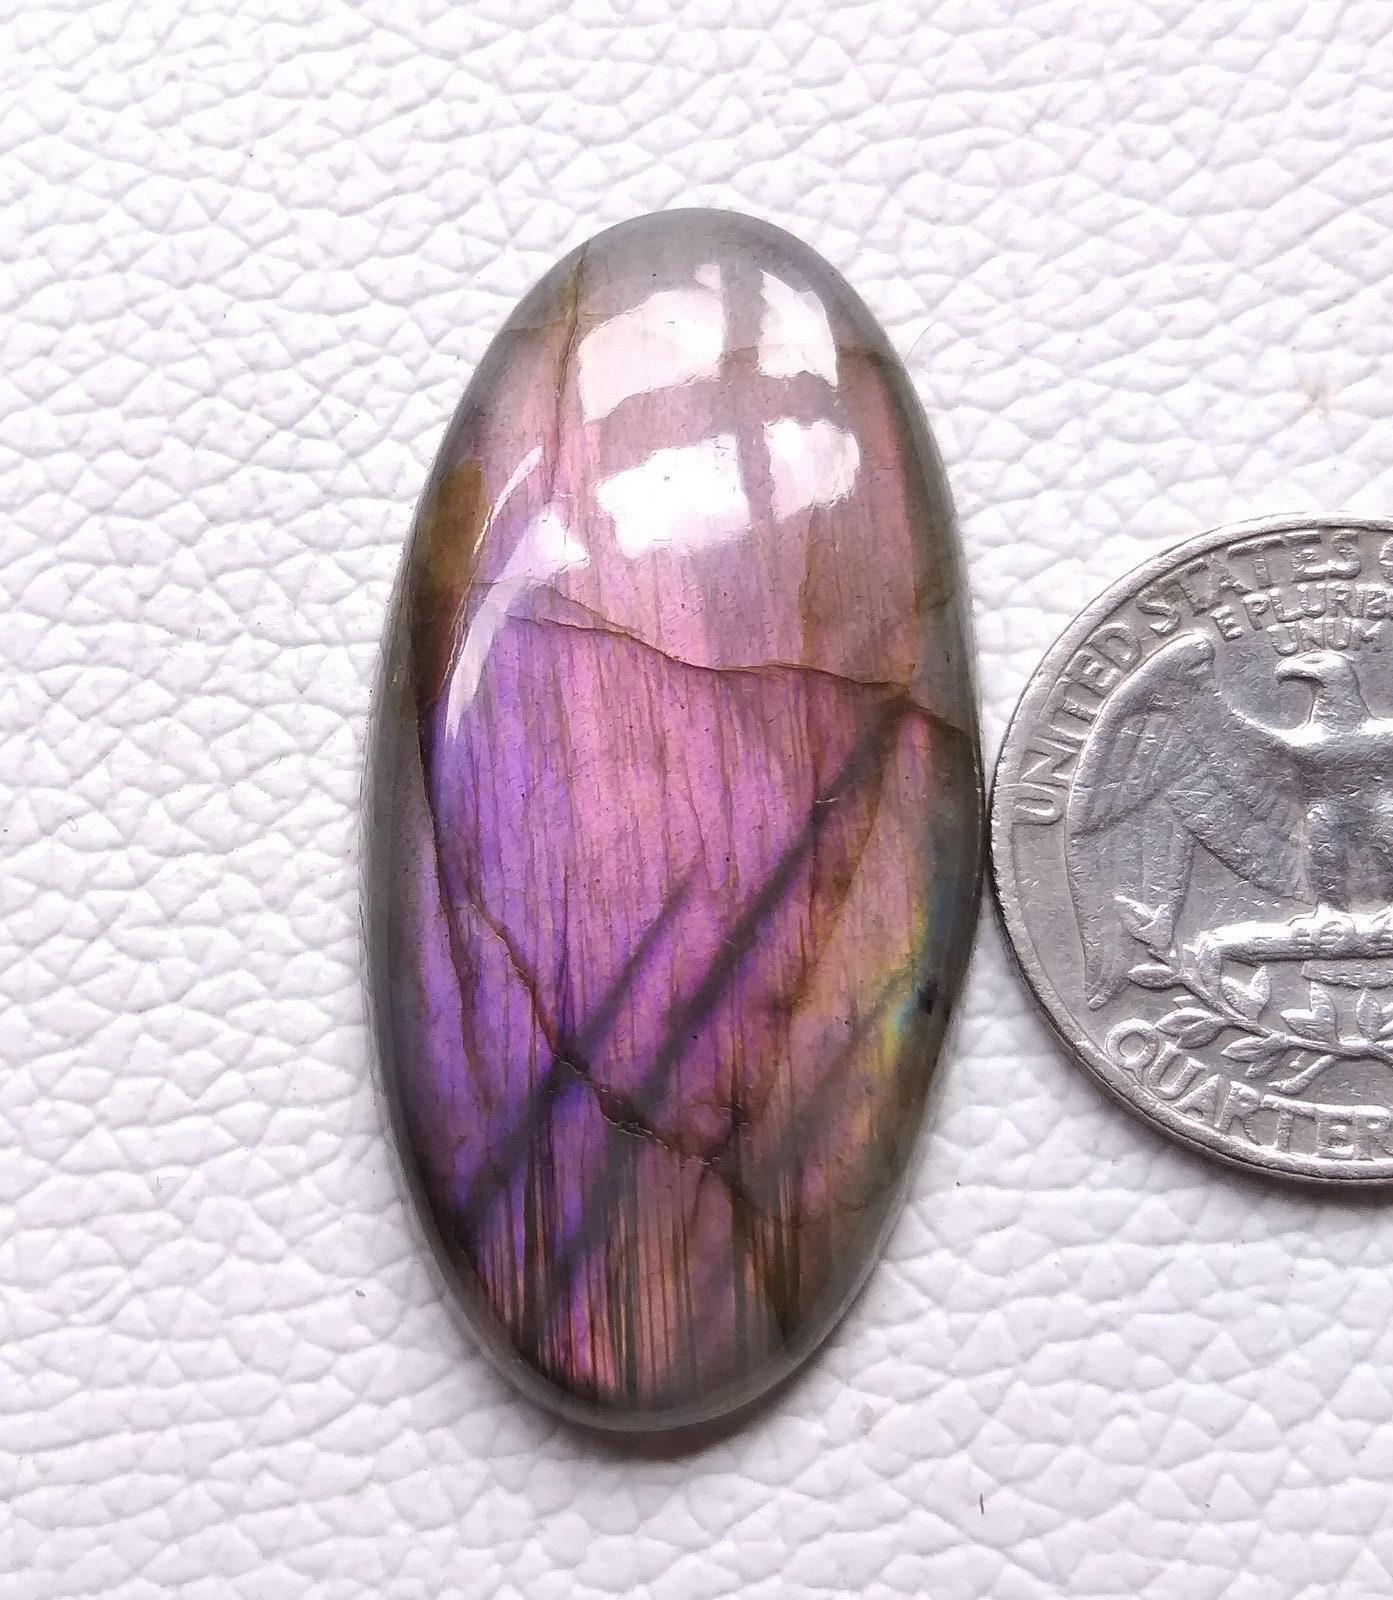 Purple Labradorite Cabochon-Purple Labradorite Smooth Heart Cabochon-47x57.5x8.5 MM Labradorite Cabochons-Purple Flashy-Wholesalegems